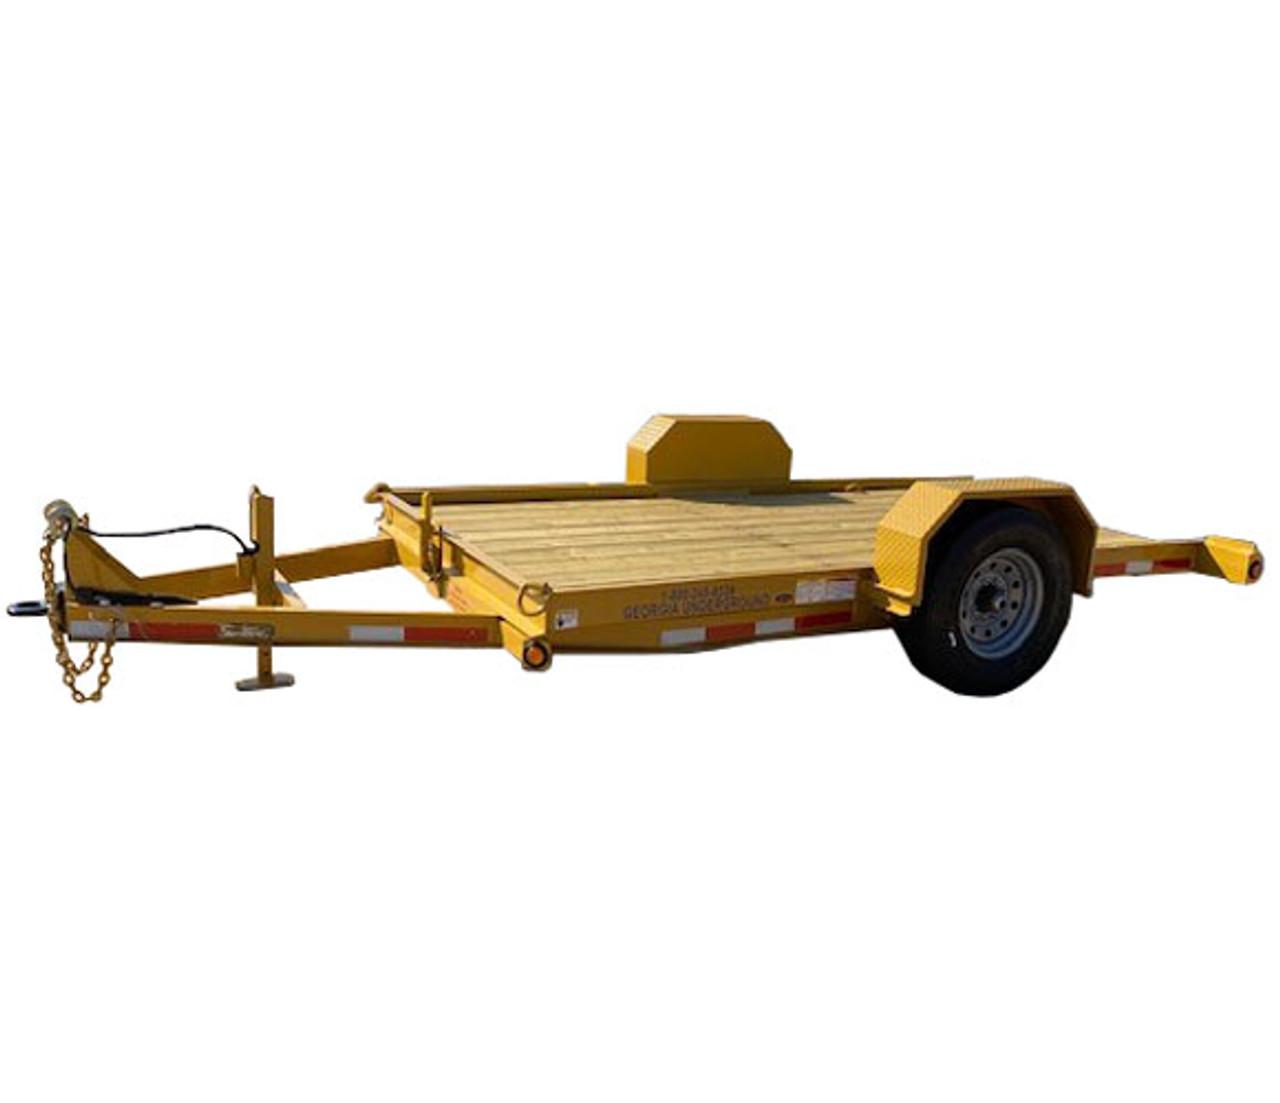 3 Ton Tilt Trailer with 12' Deck - Single Axle